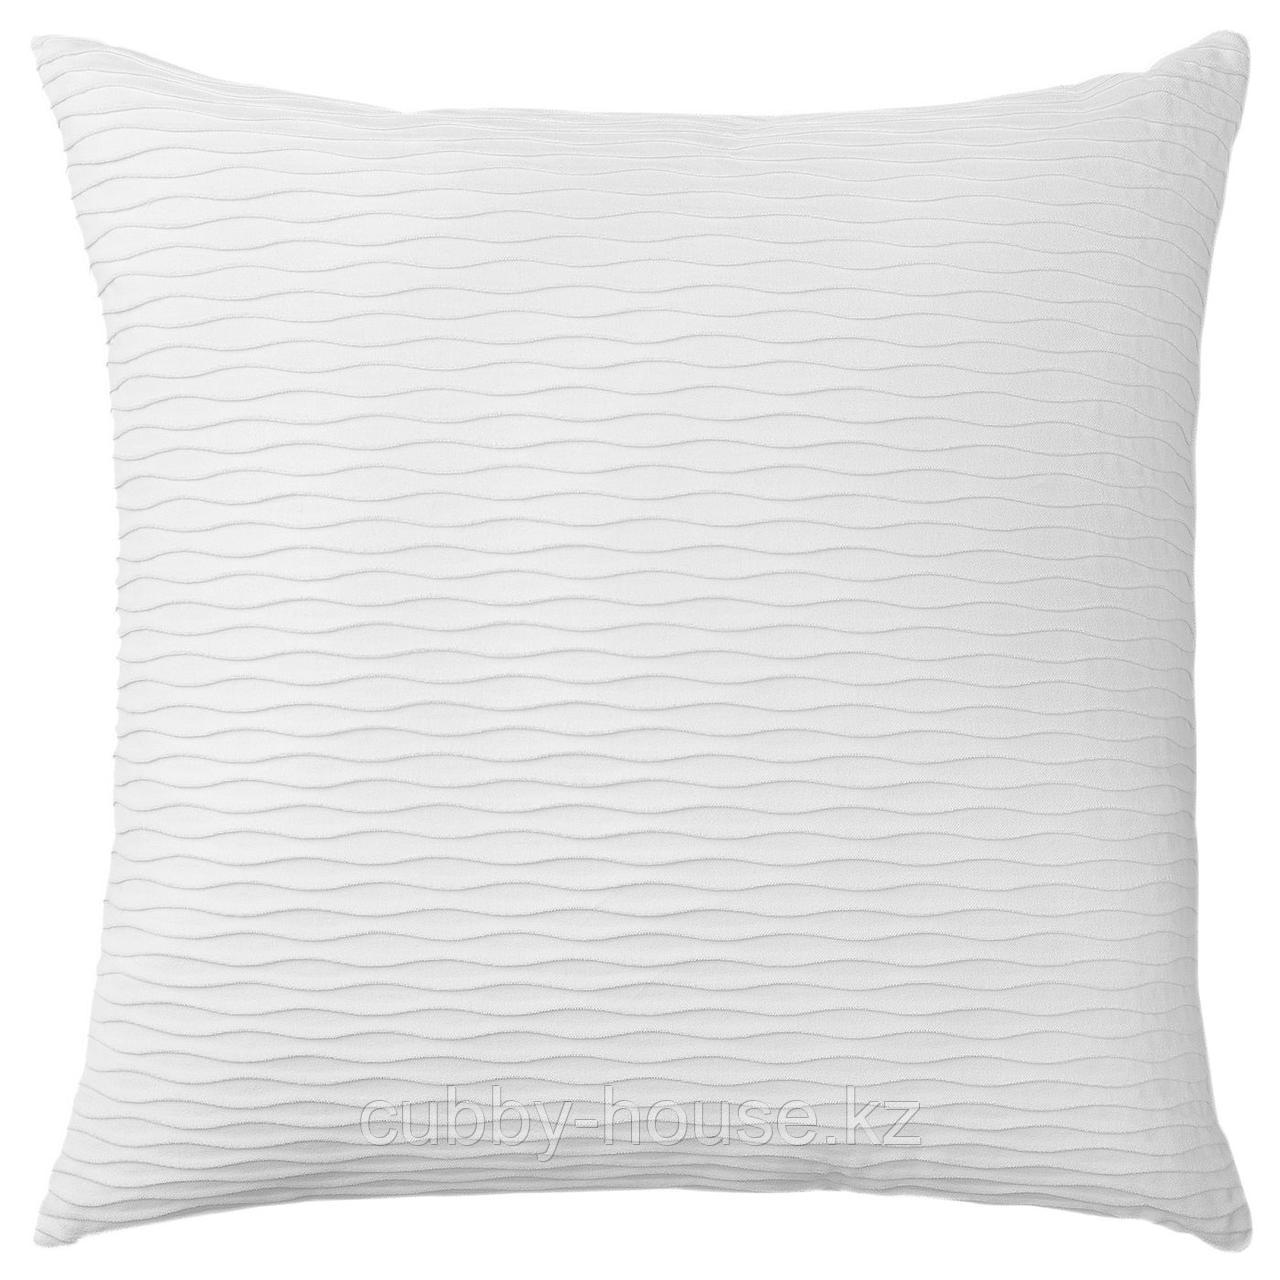 ВЭНДЕРОТ Подушка, белый, 50x50 см